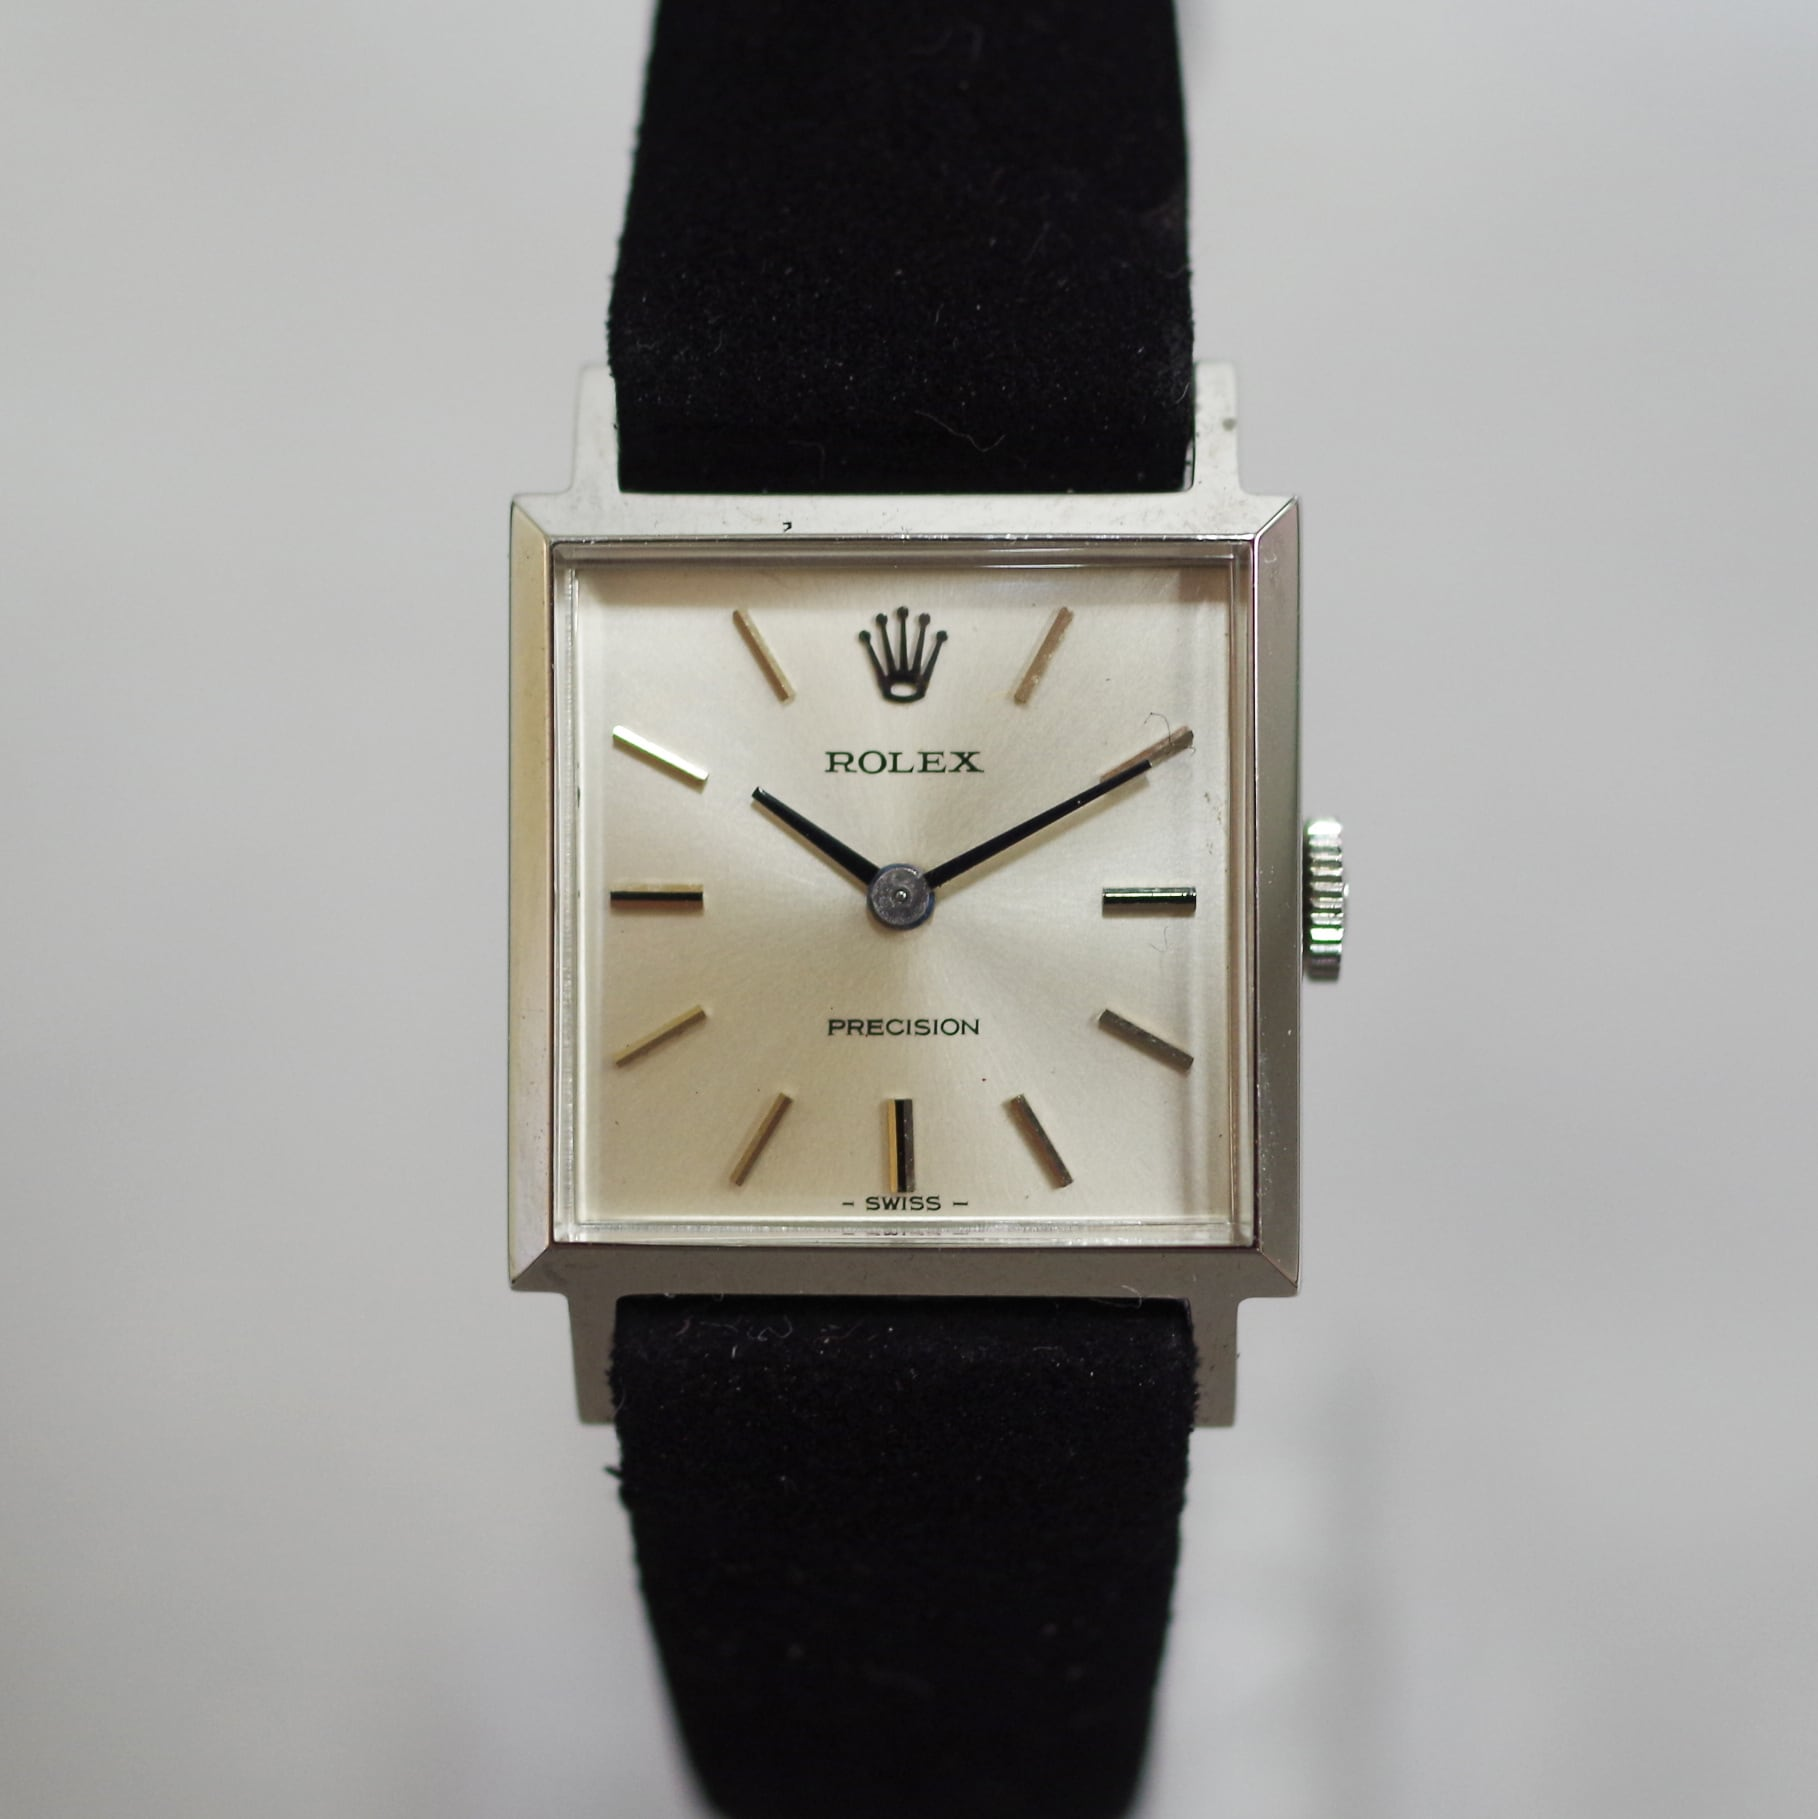 ROLEX ロレックス プレシジョン スクエア SS レザーベルト 手巻き 腕時計 レディース